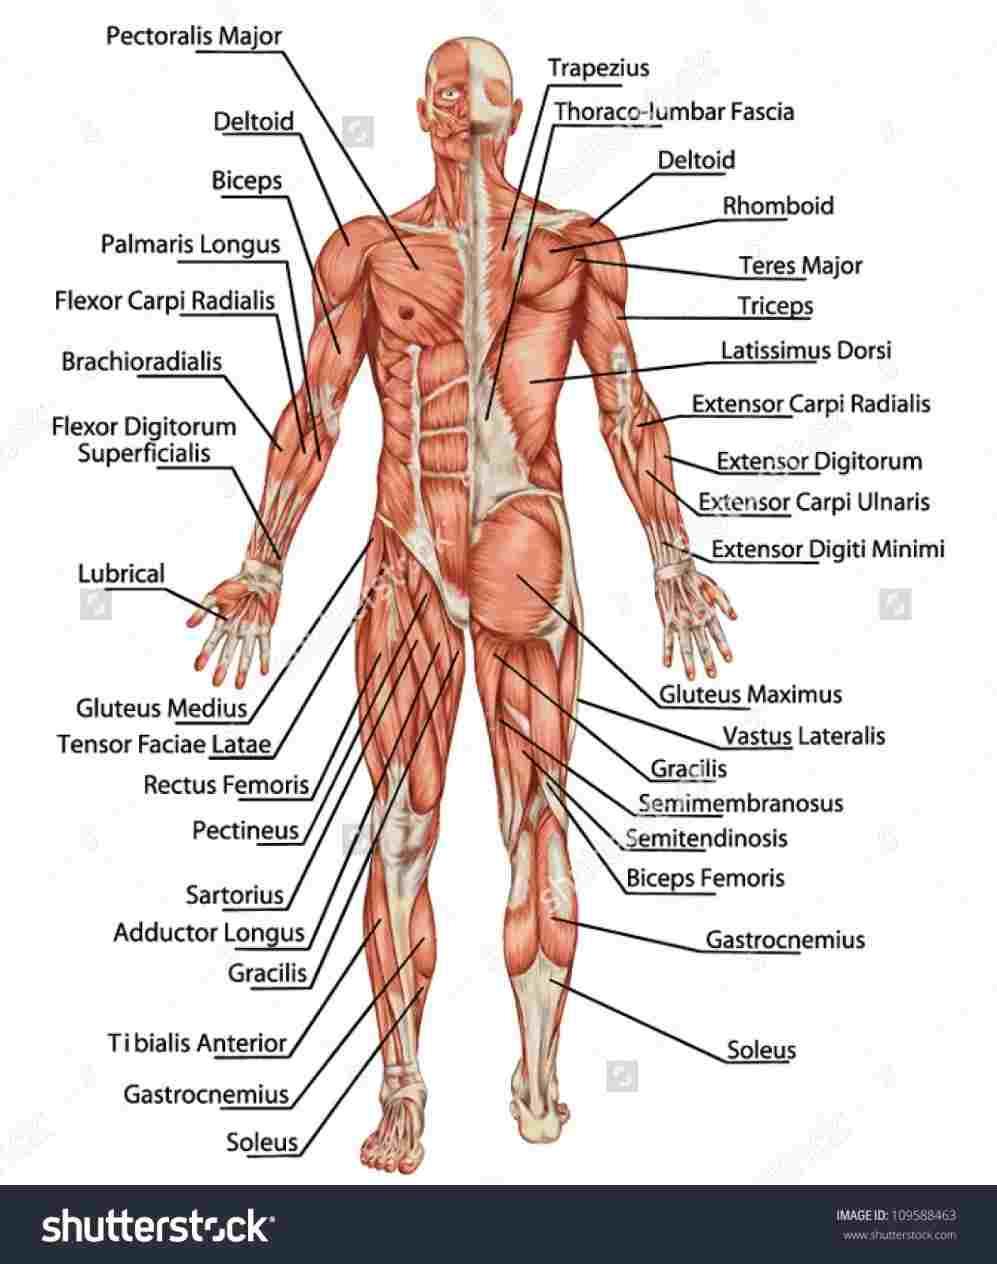 Body Organs Diagram Chart Upper Body Anatomy Diagram Of Upper Body Organs Human